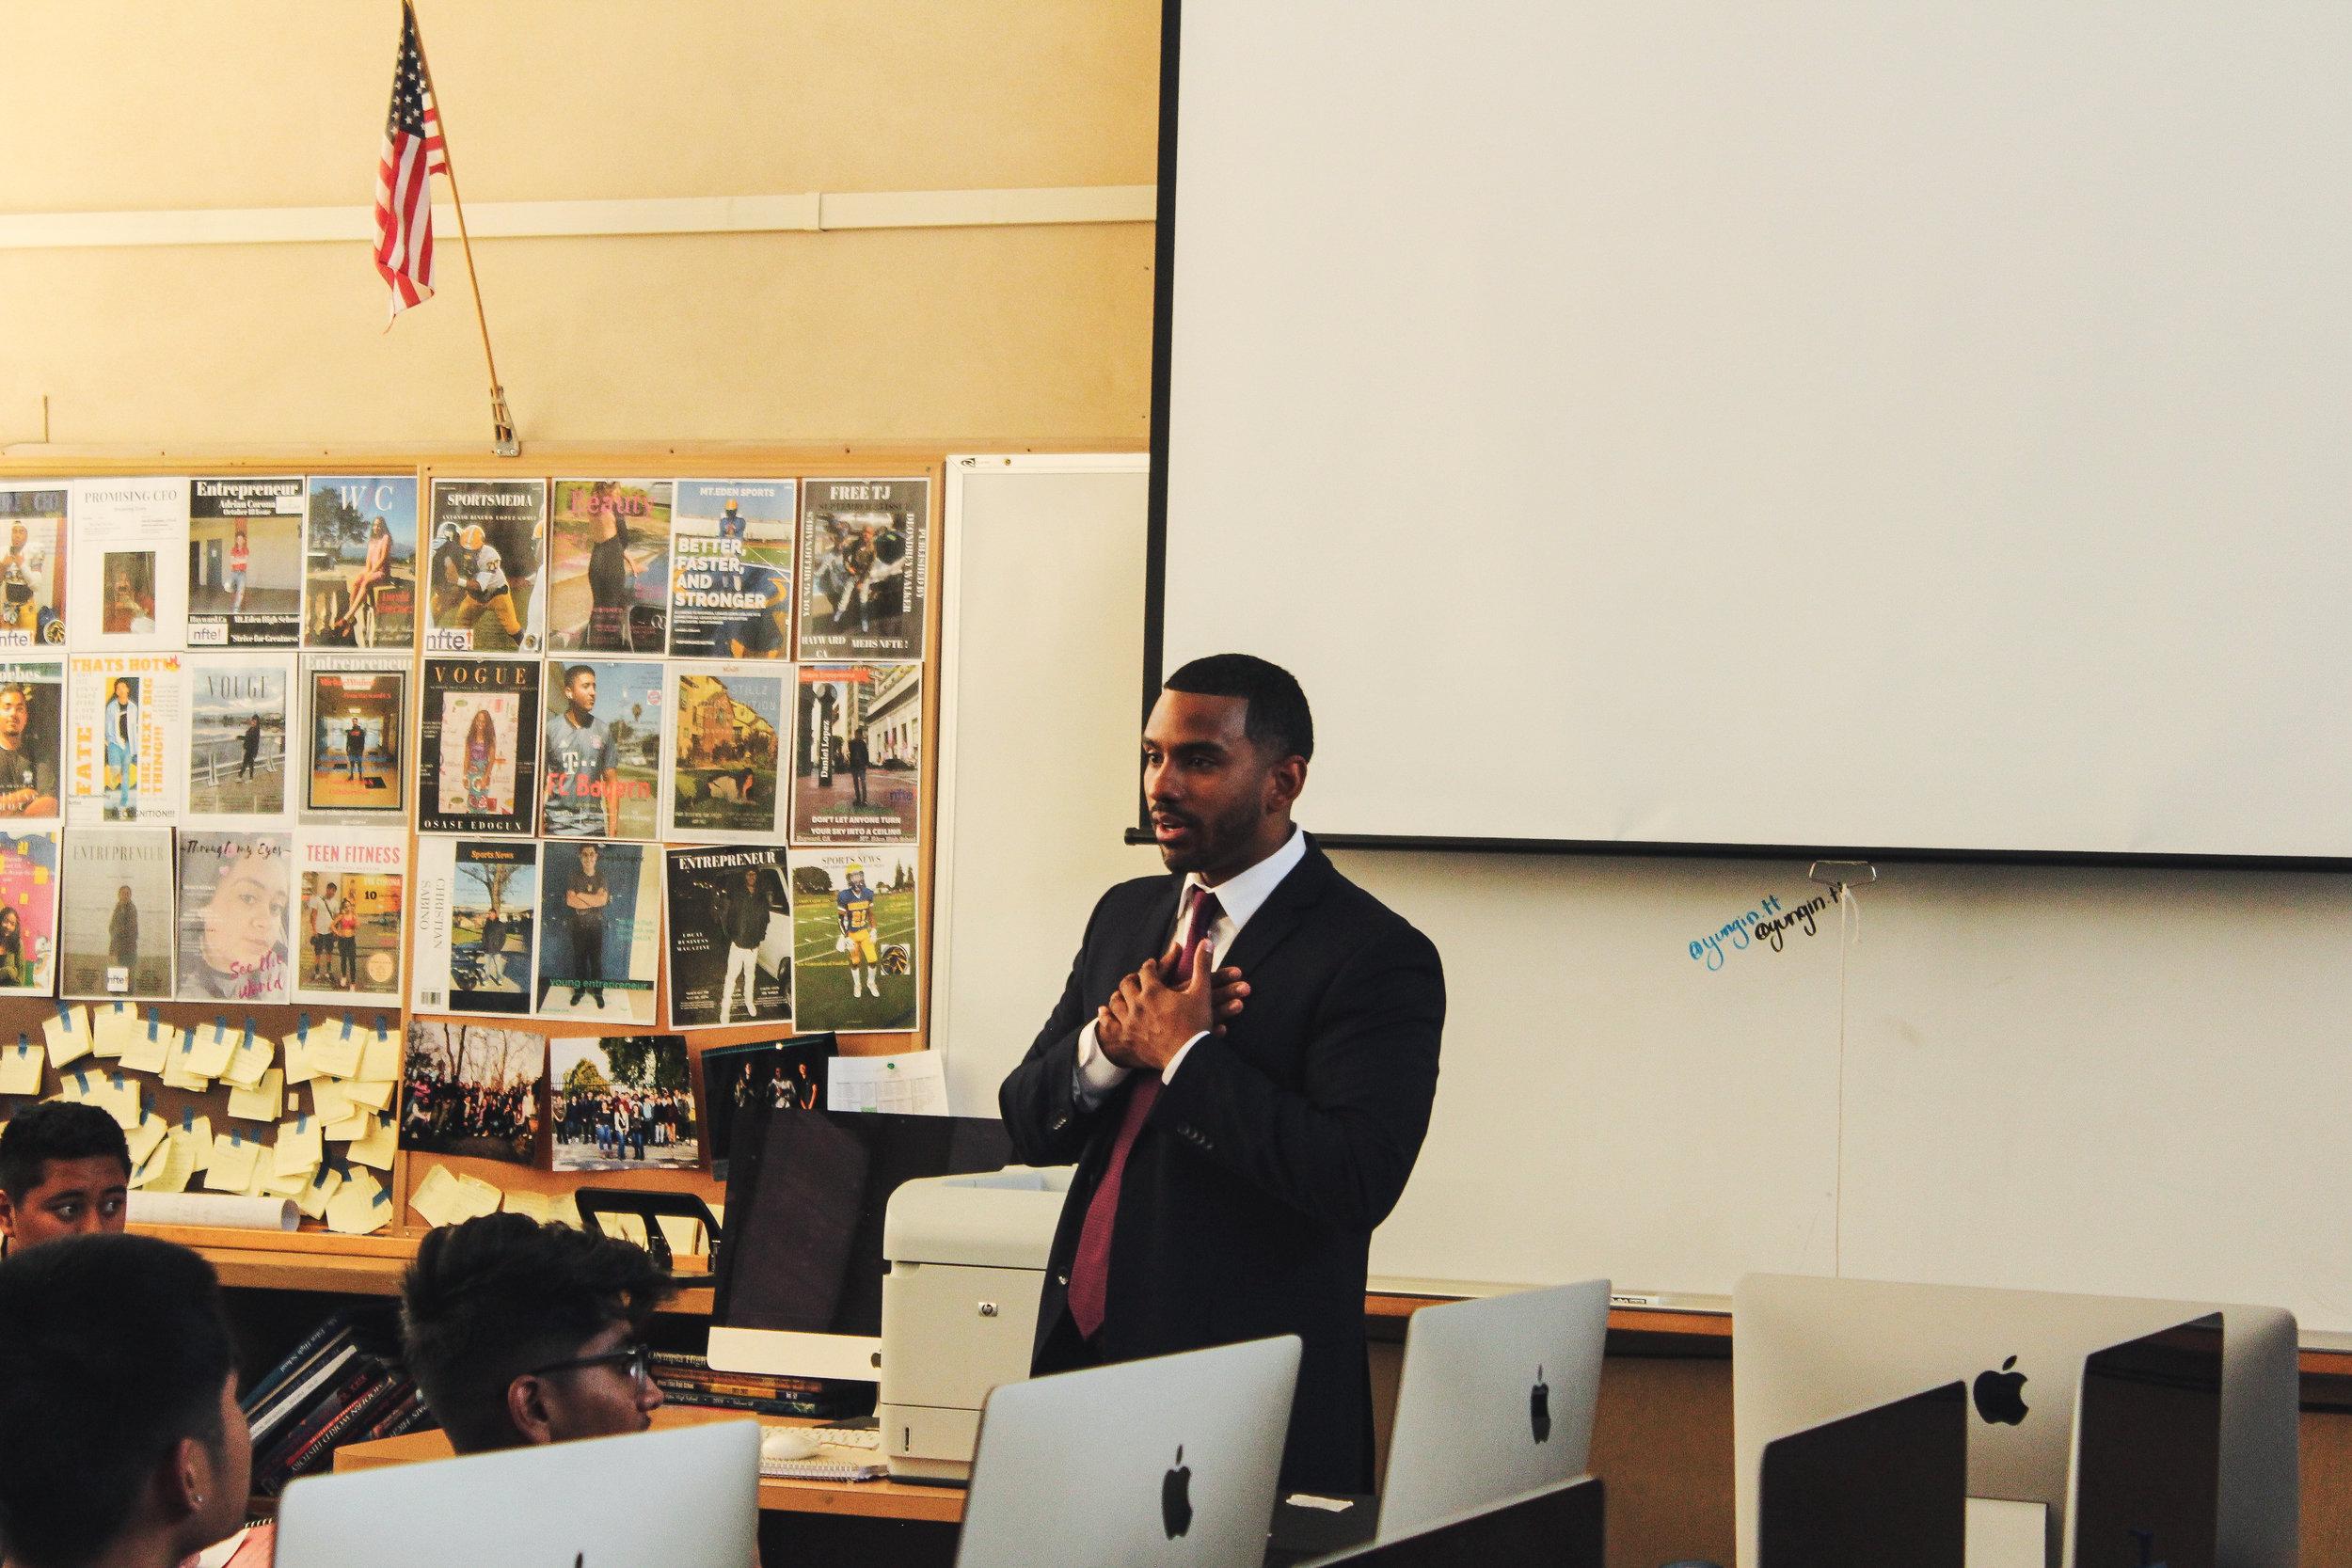 Dr. Derrell Blackburn, Entrepreneur & Educator (Photo credit: OSCAR REYES)